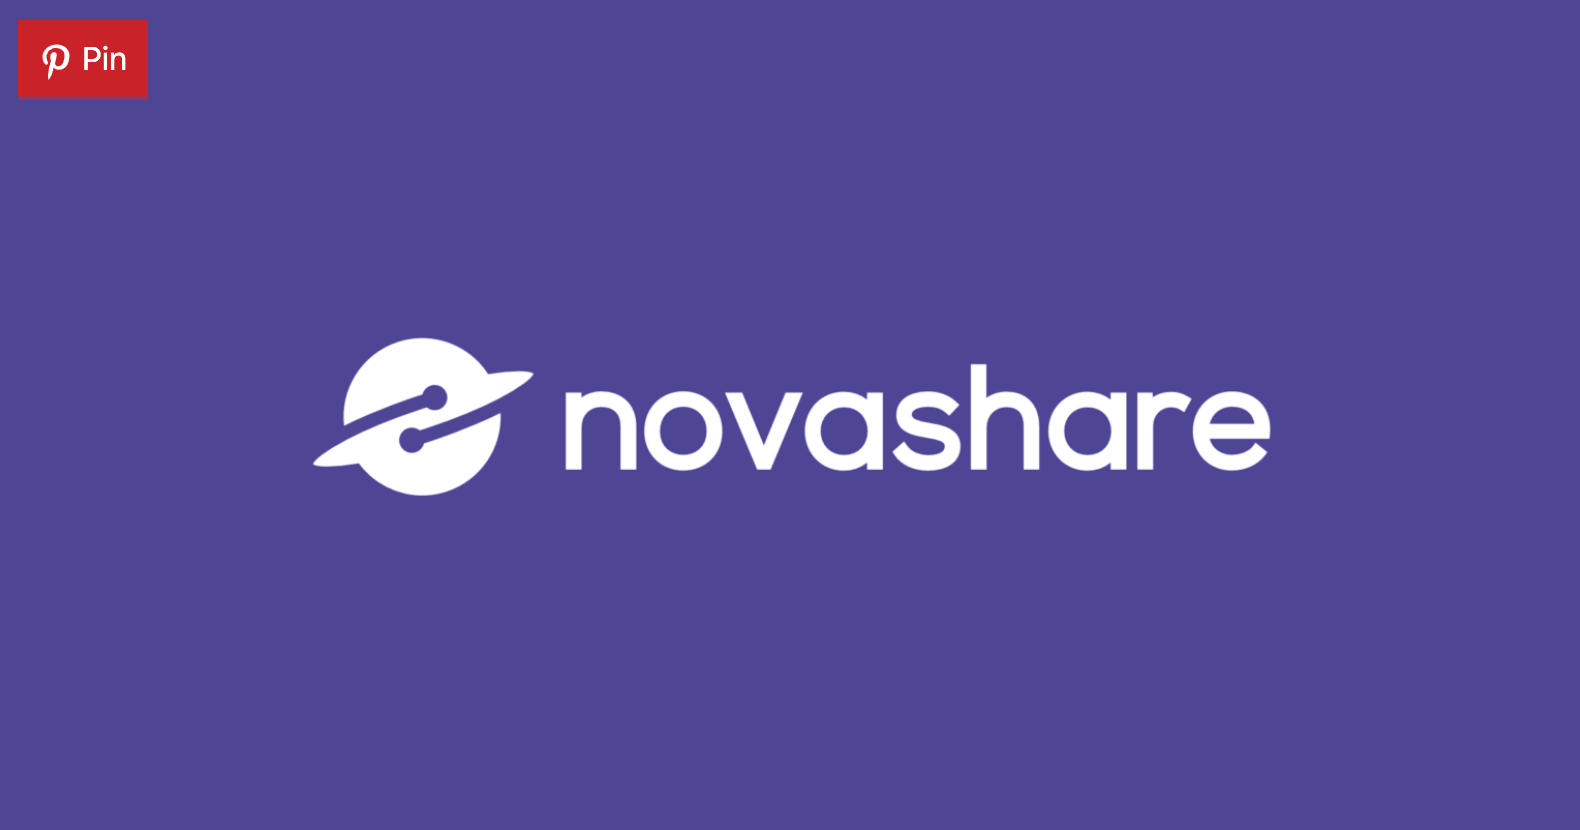 Novashare Image Pins